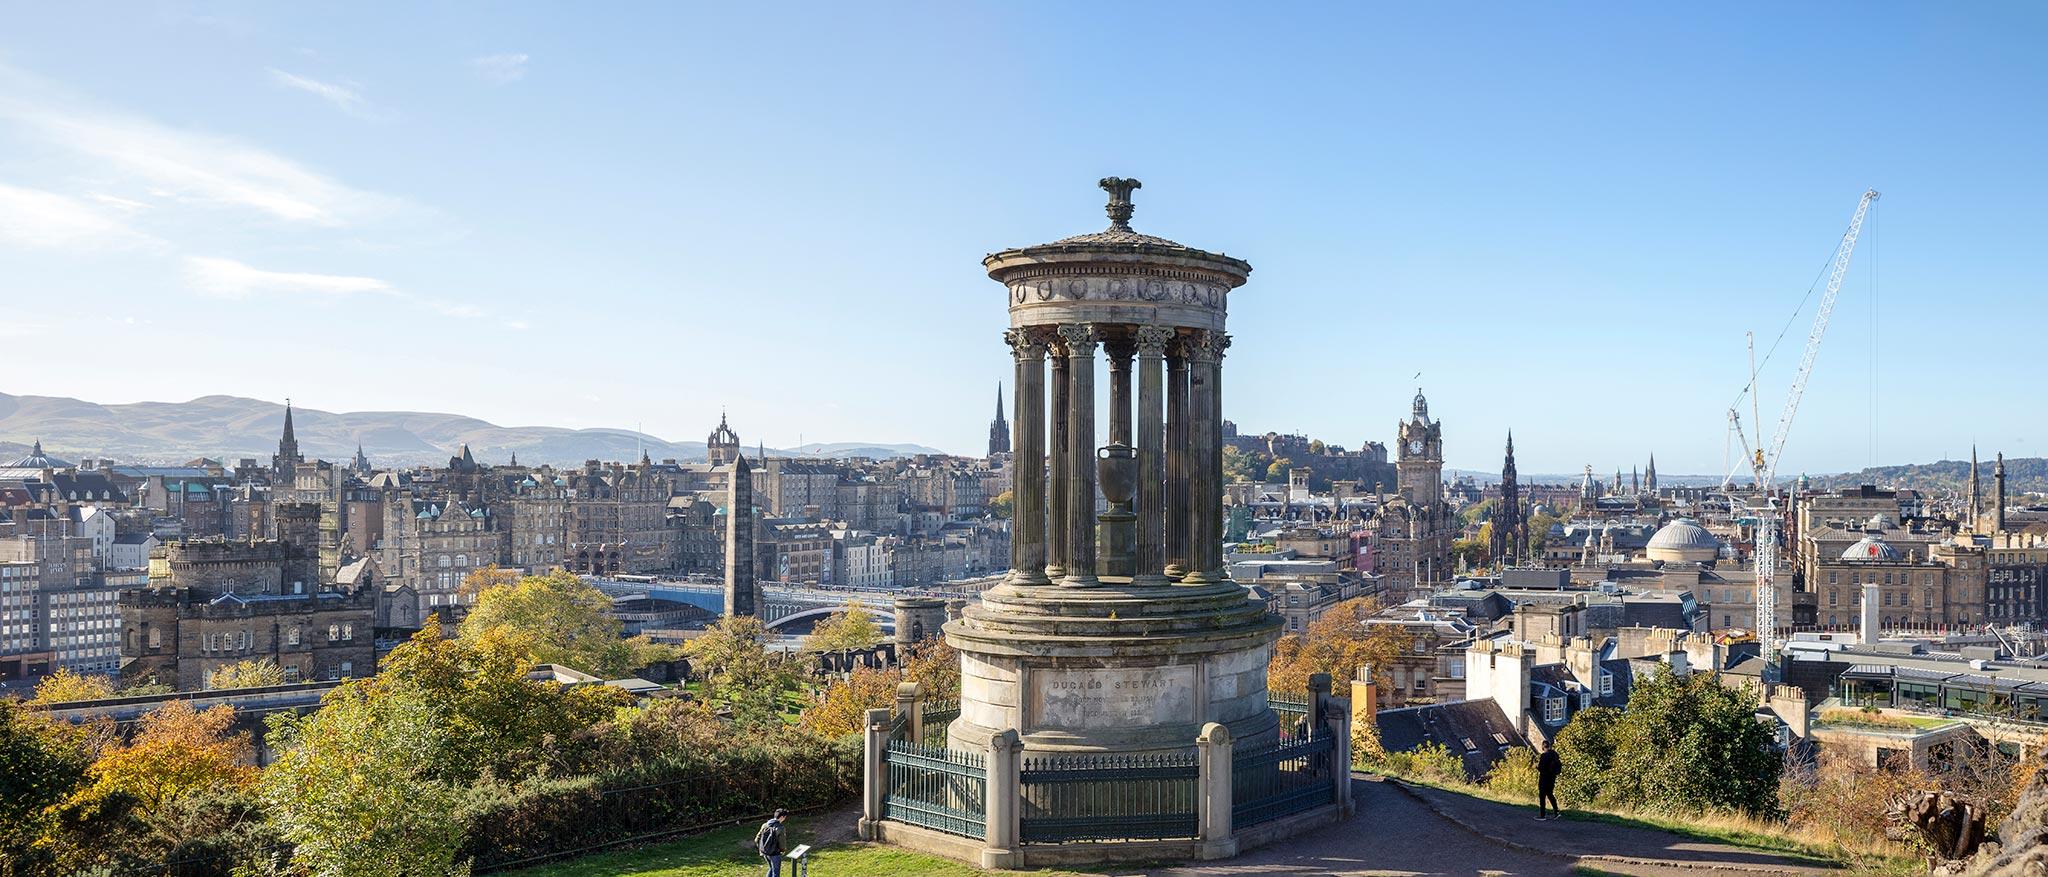 Calton Hill, Edinburgh © Tuulia Kolehmainen